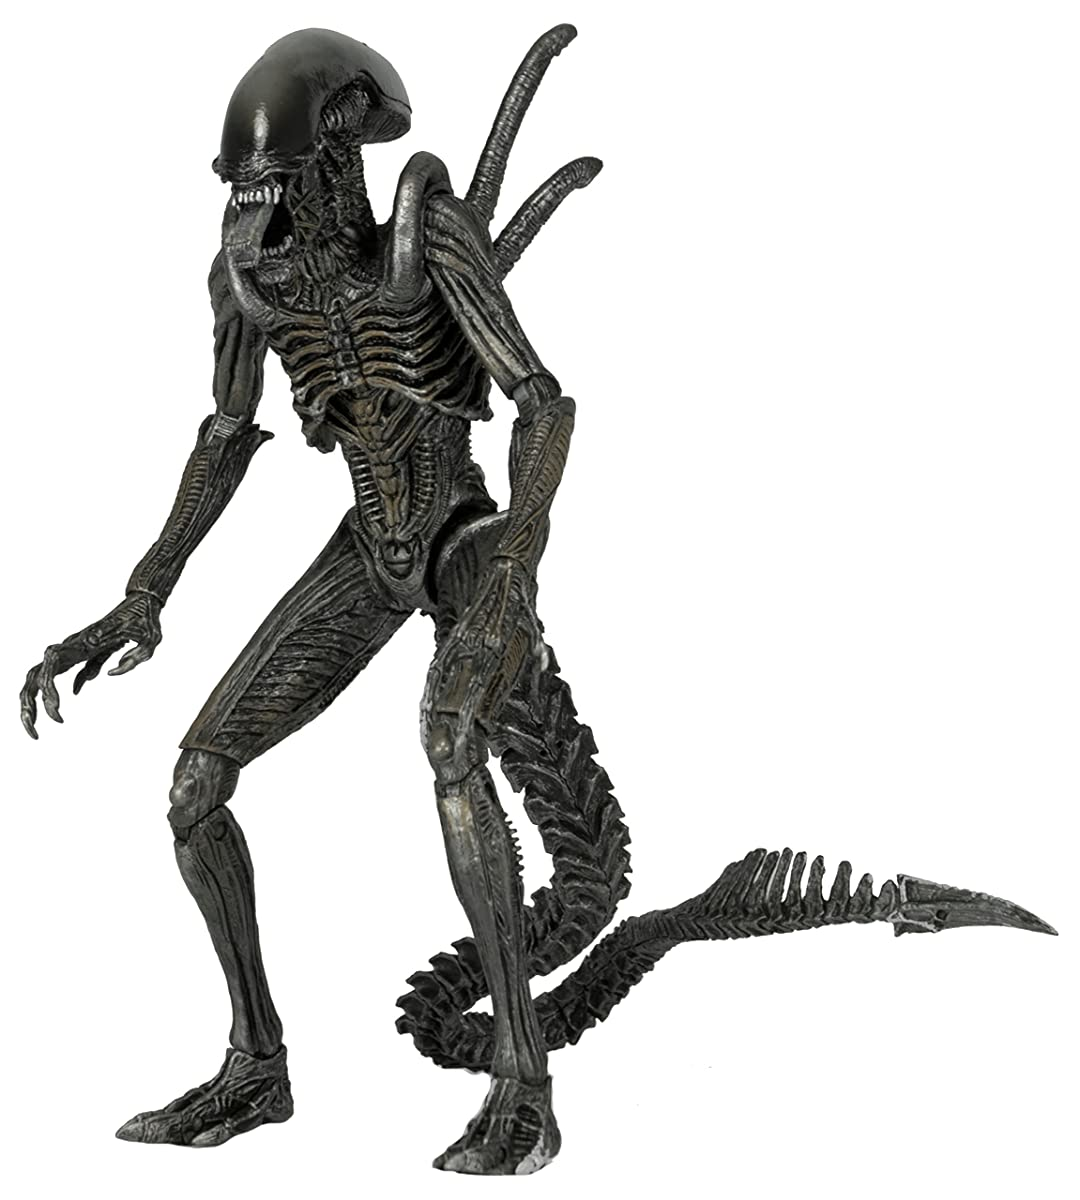 "NECA Aliens Series 7 AvP Warrior Action Figure (7"" Scale)"